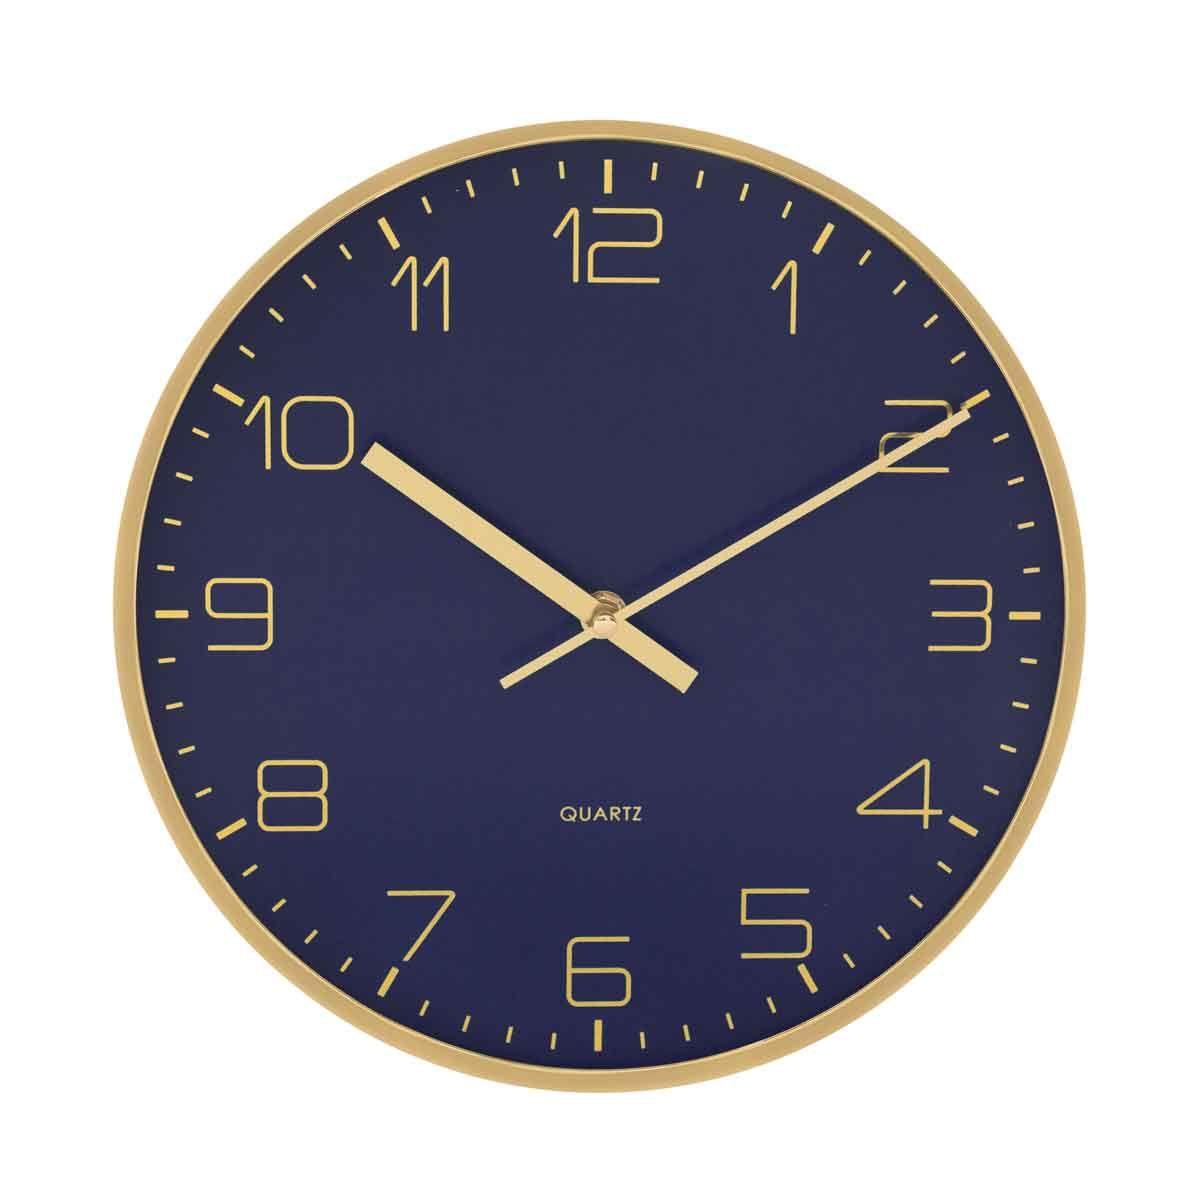 Horloge silencieuse ronde